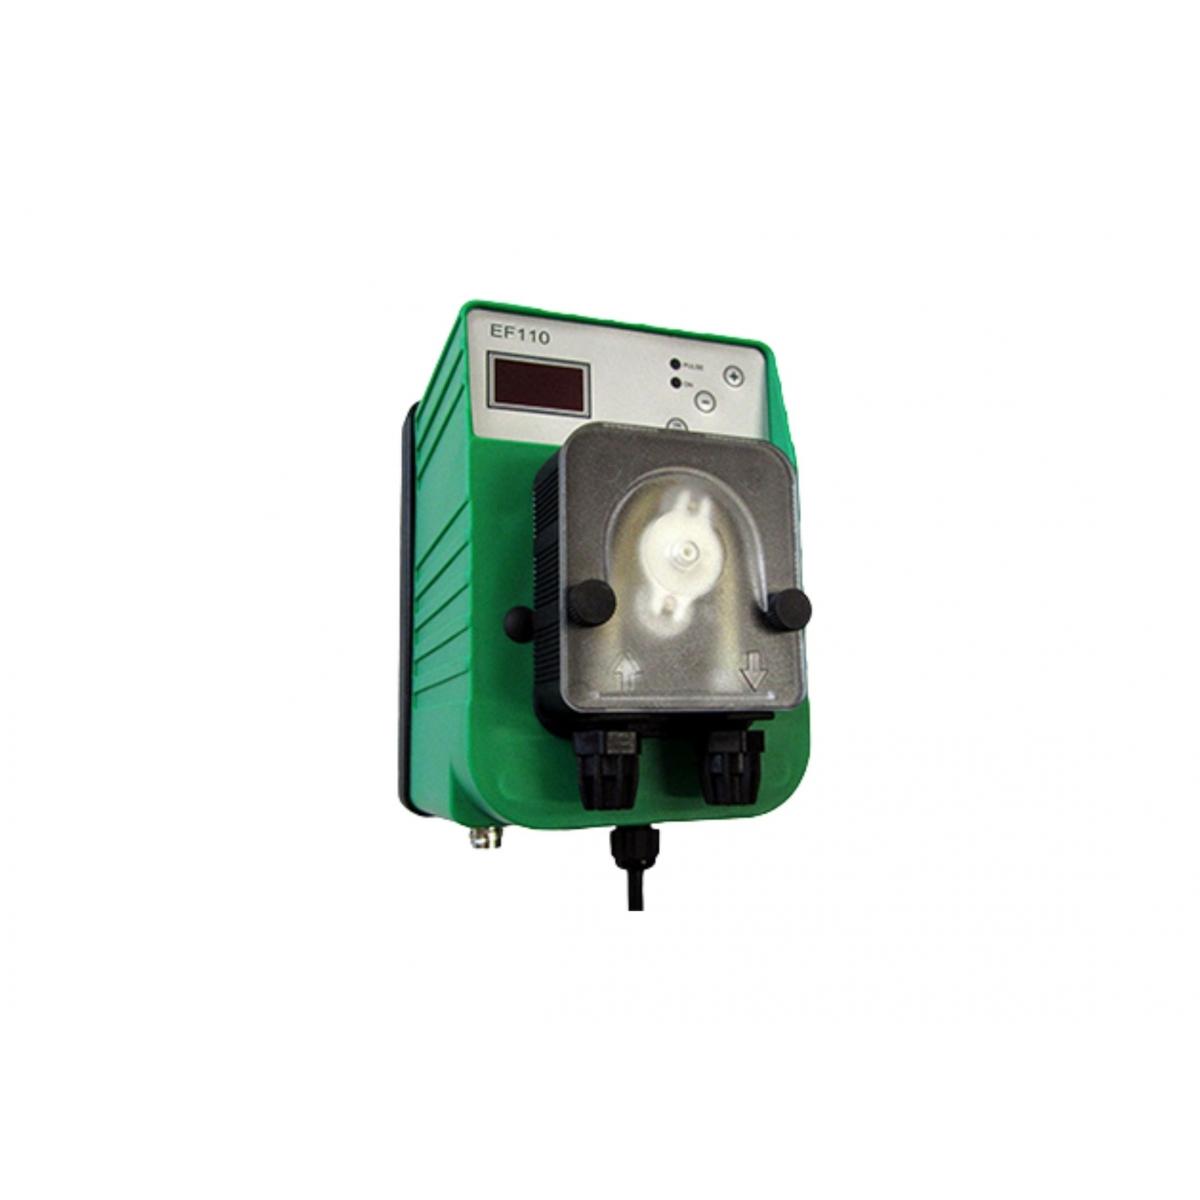 PH Controller & Dosing Pump Basic 1,8 l/h-Dosatech